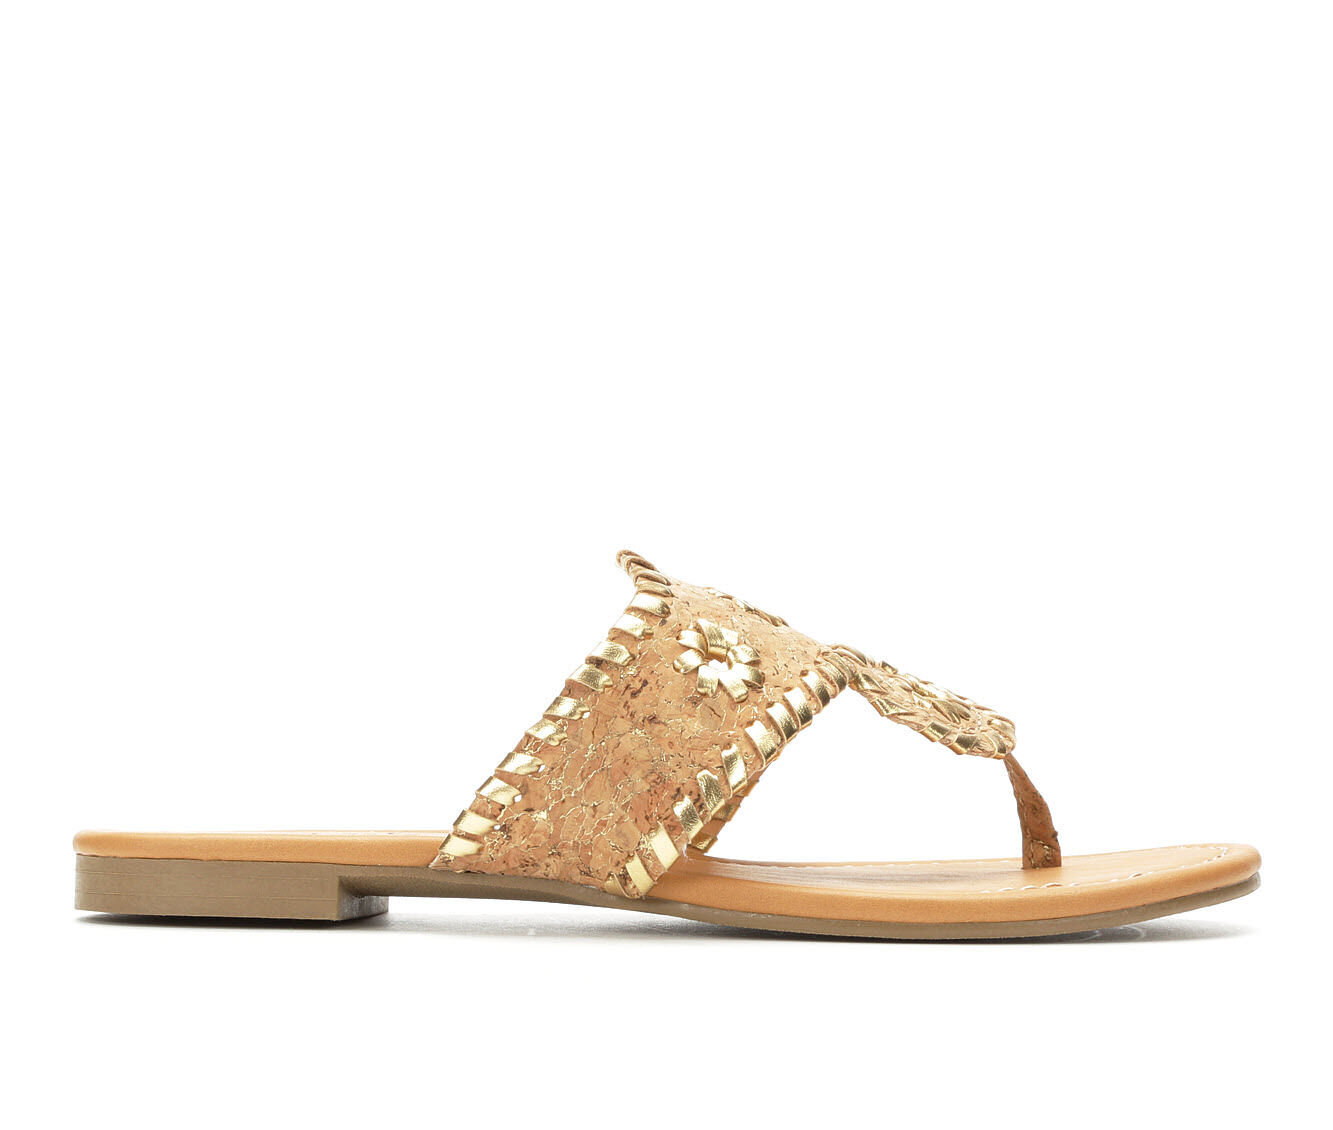 Women's Y-Not Crissy Flip-Flops Cork With Gold